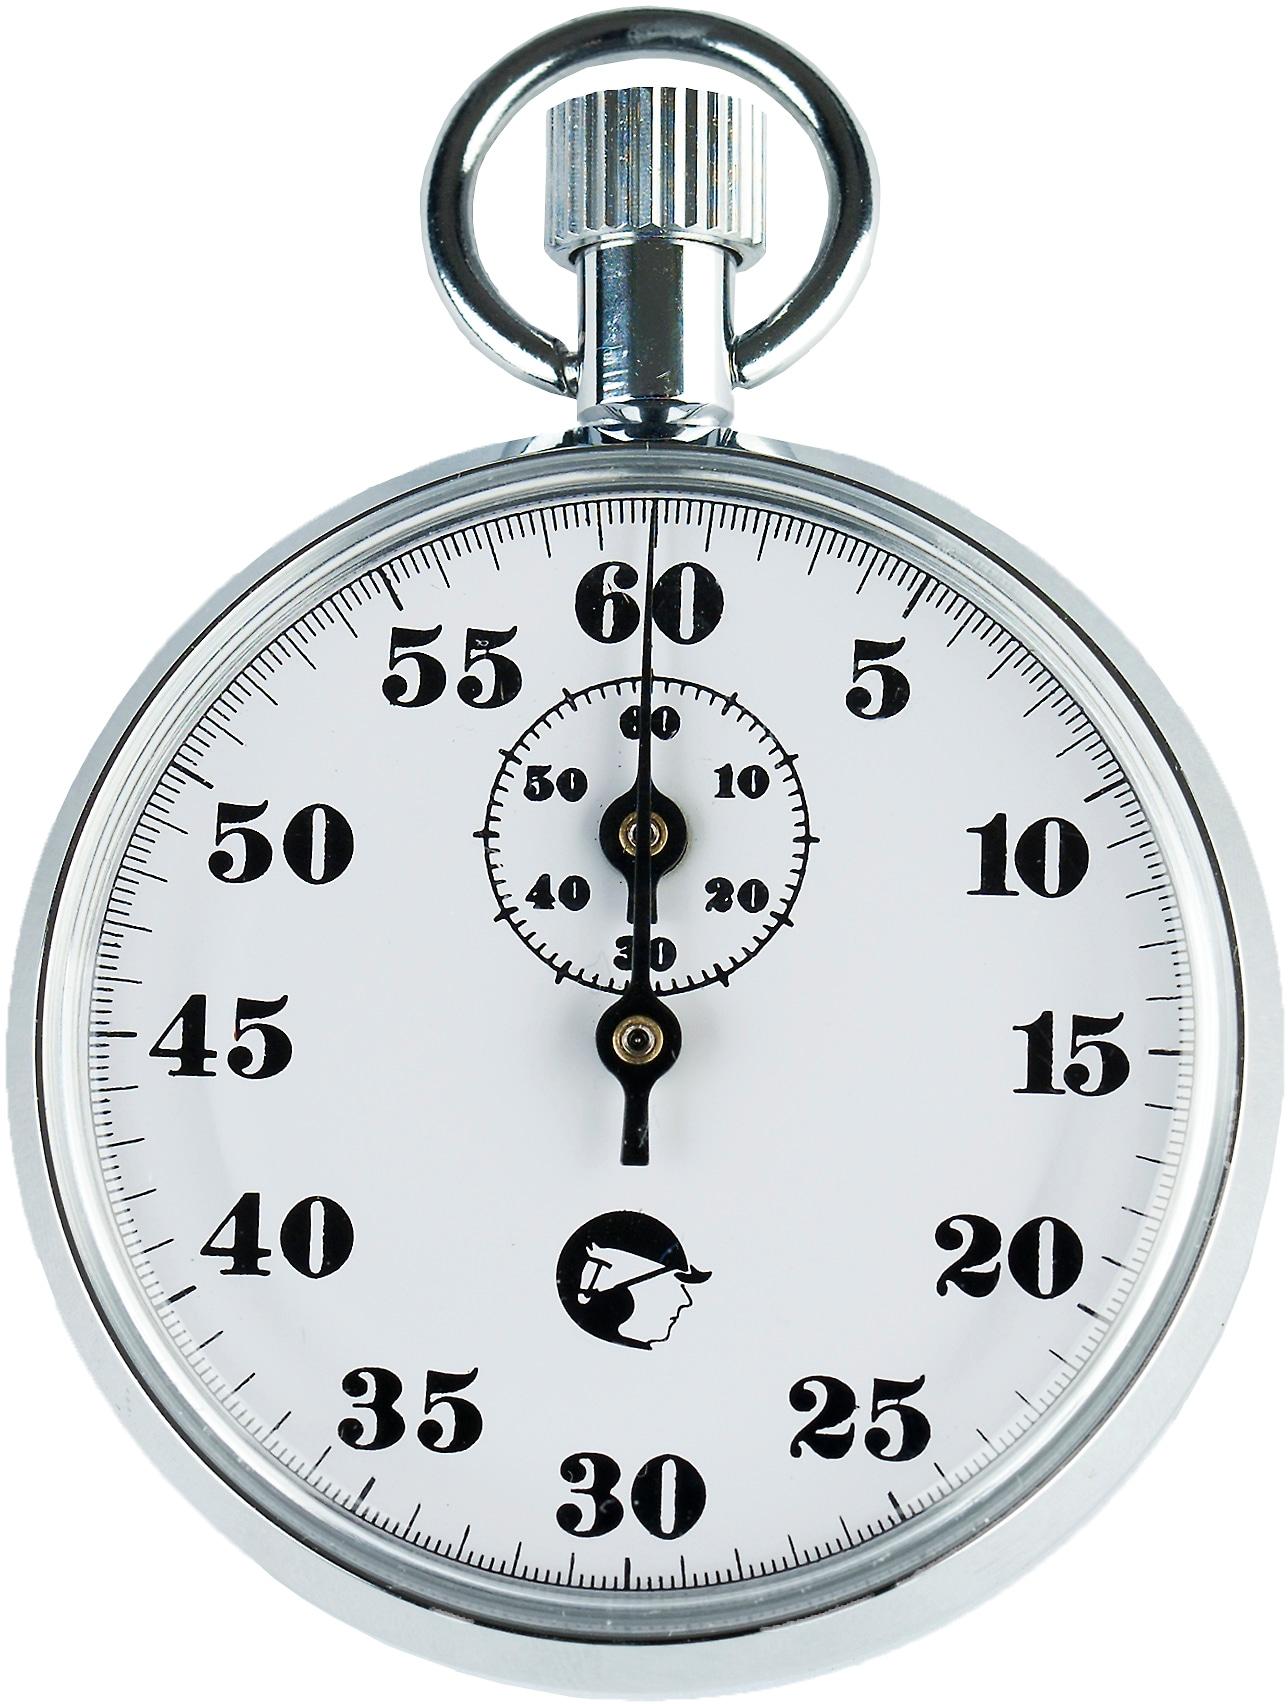 Analog stoppeklokke - 60 sekunder